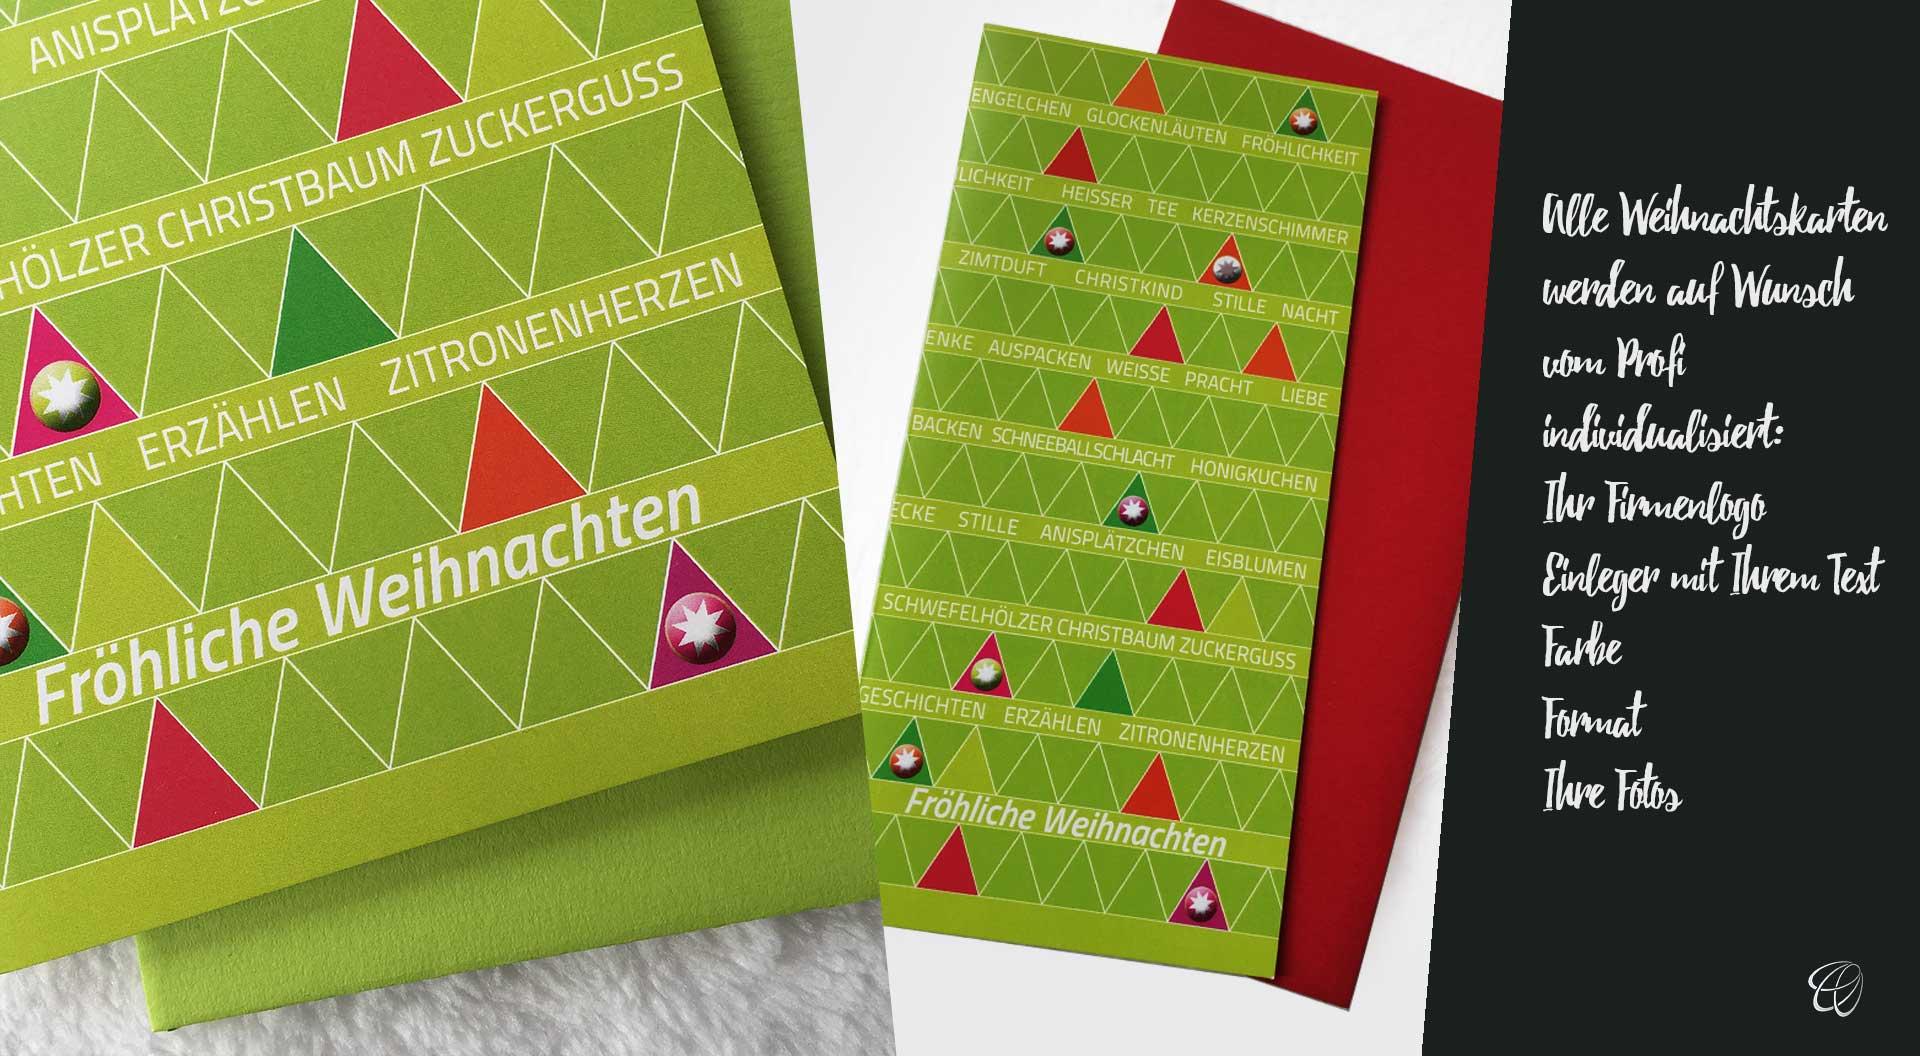 Moderne Weihnachtskarten.Moderne Weihnachtskarten Geschaftliche Weihnachtskarten